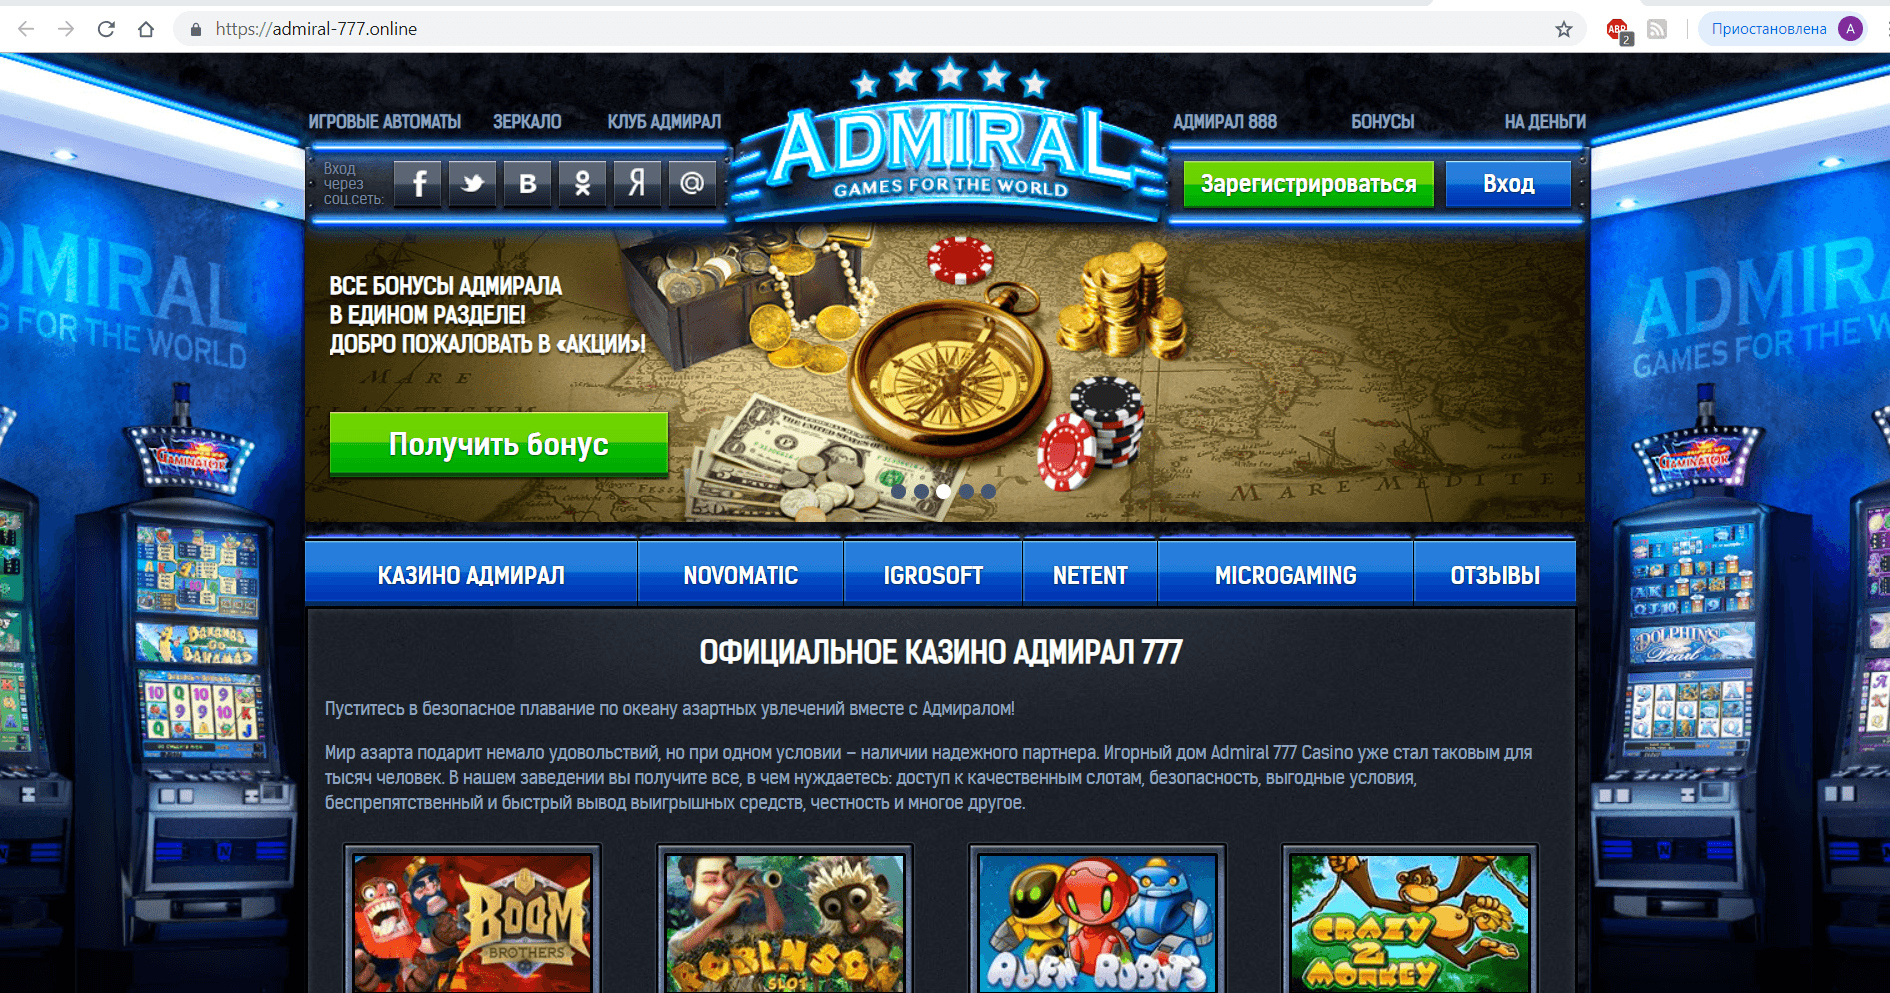 Онлайн казино azartplay отзывы видео чат рулетка русская онлайн